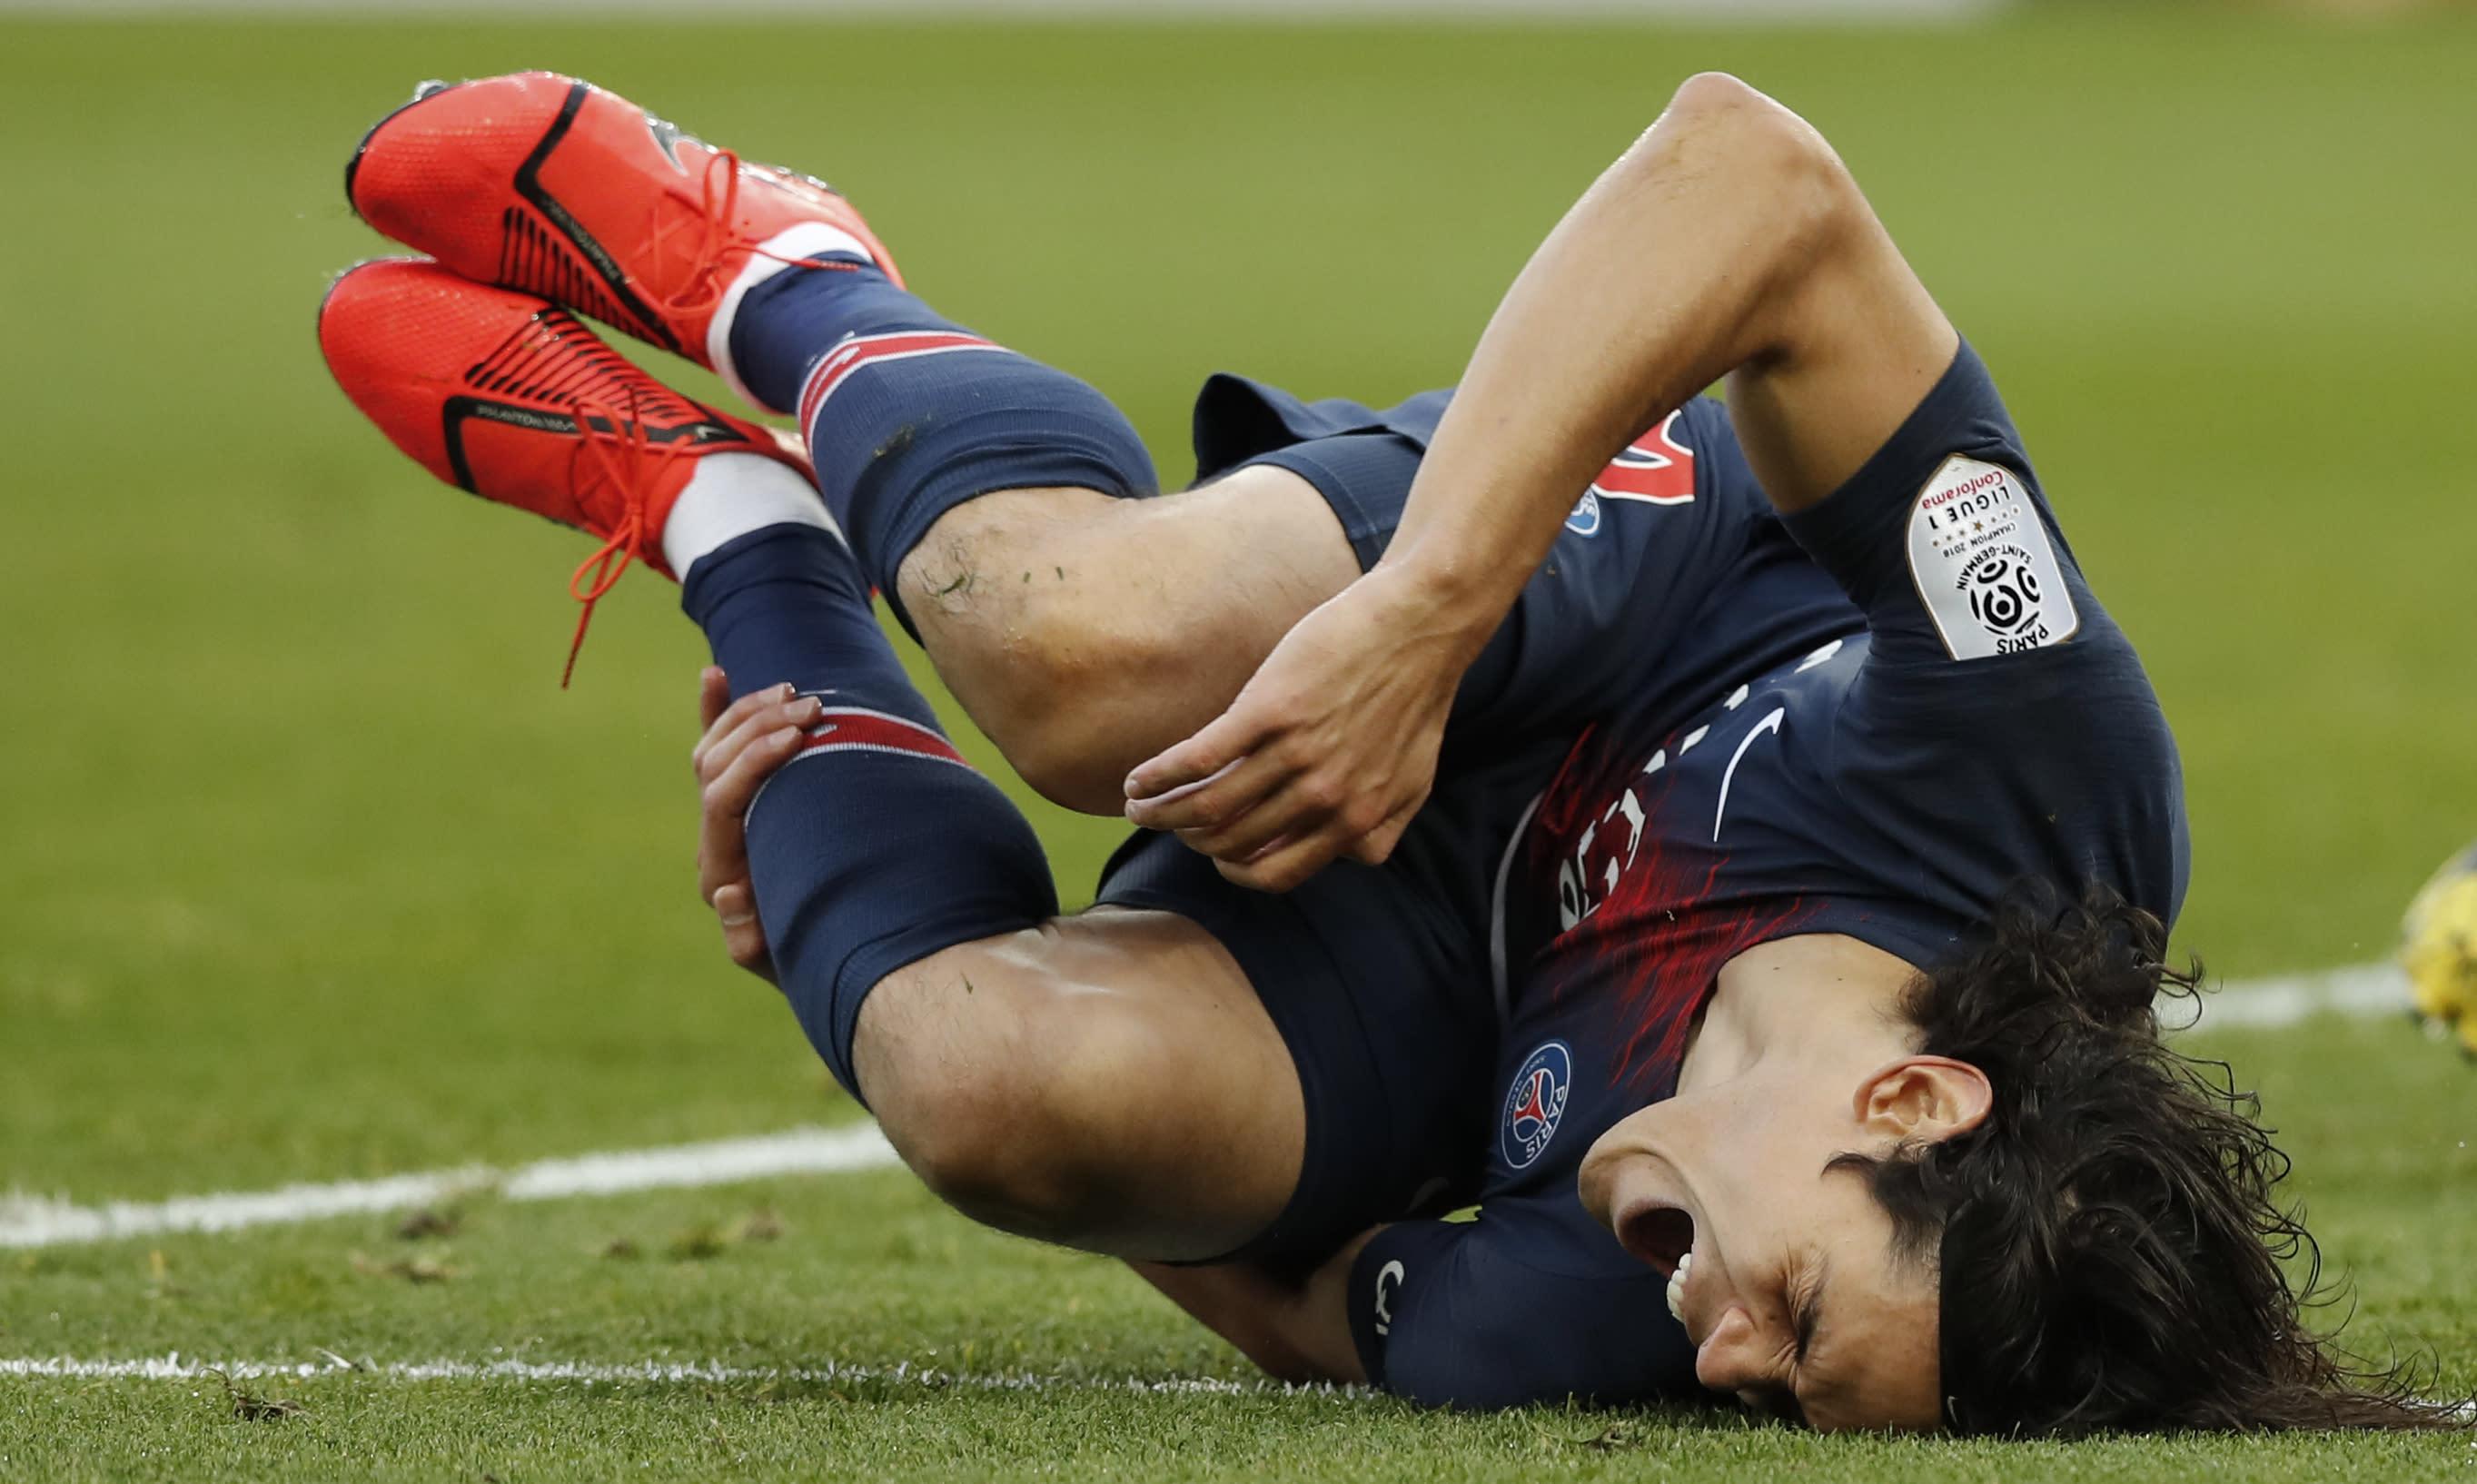 Psg Missing Cavani For Champions League 1st Leg V Man United